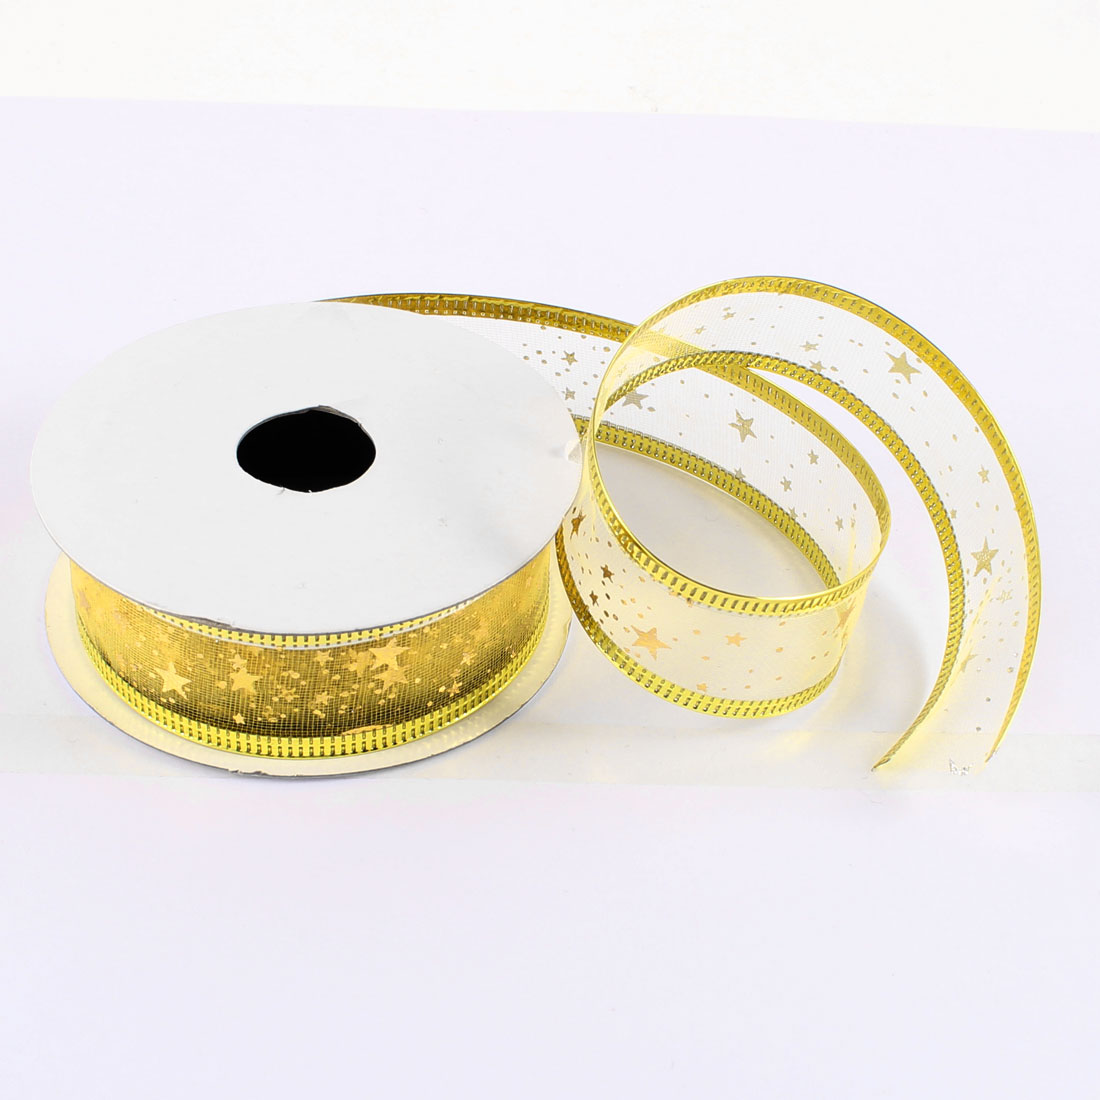 Christmas Festival Crafts Decor Gold Tone Edge Ribbon Roll Tape Yellow